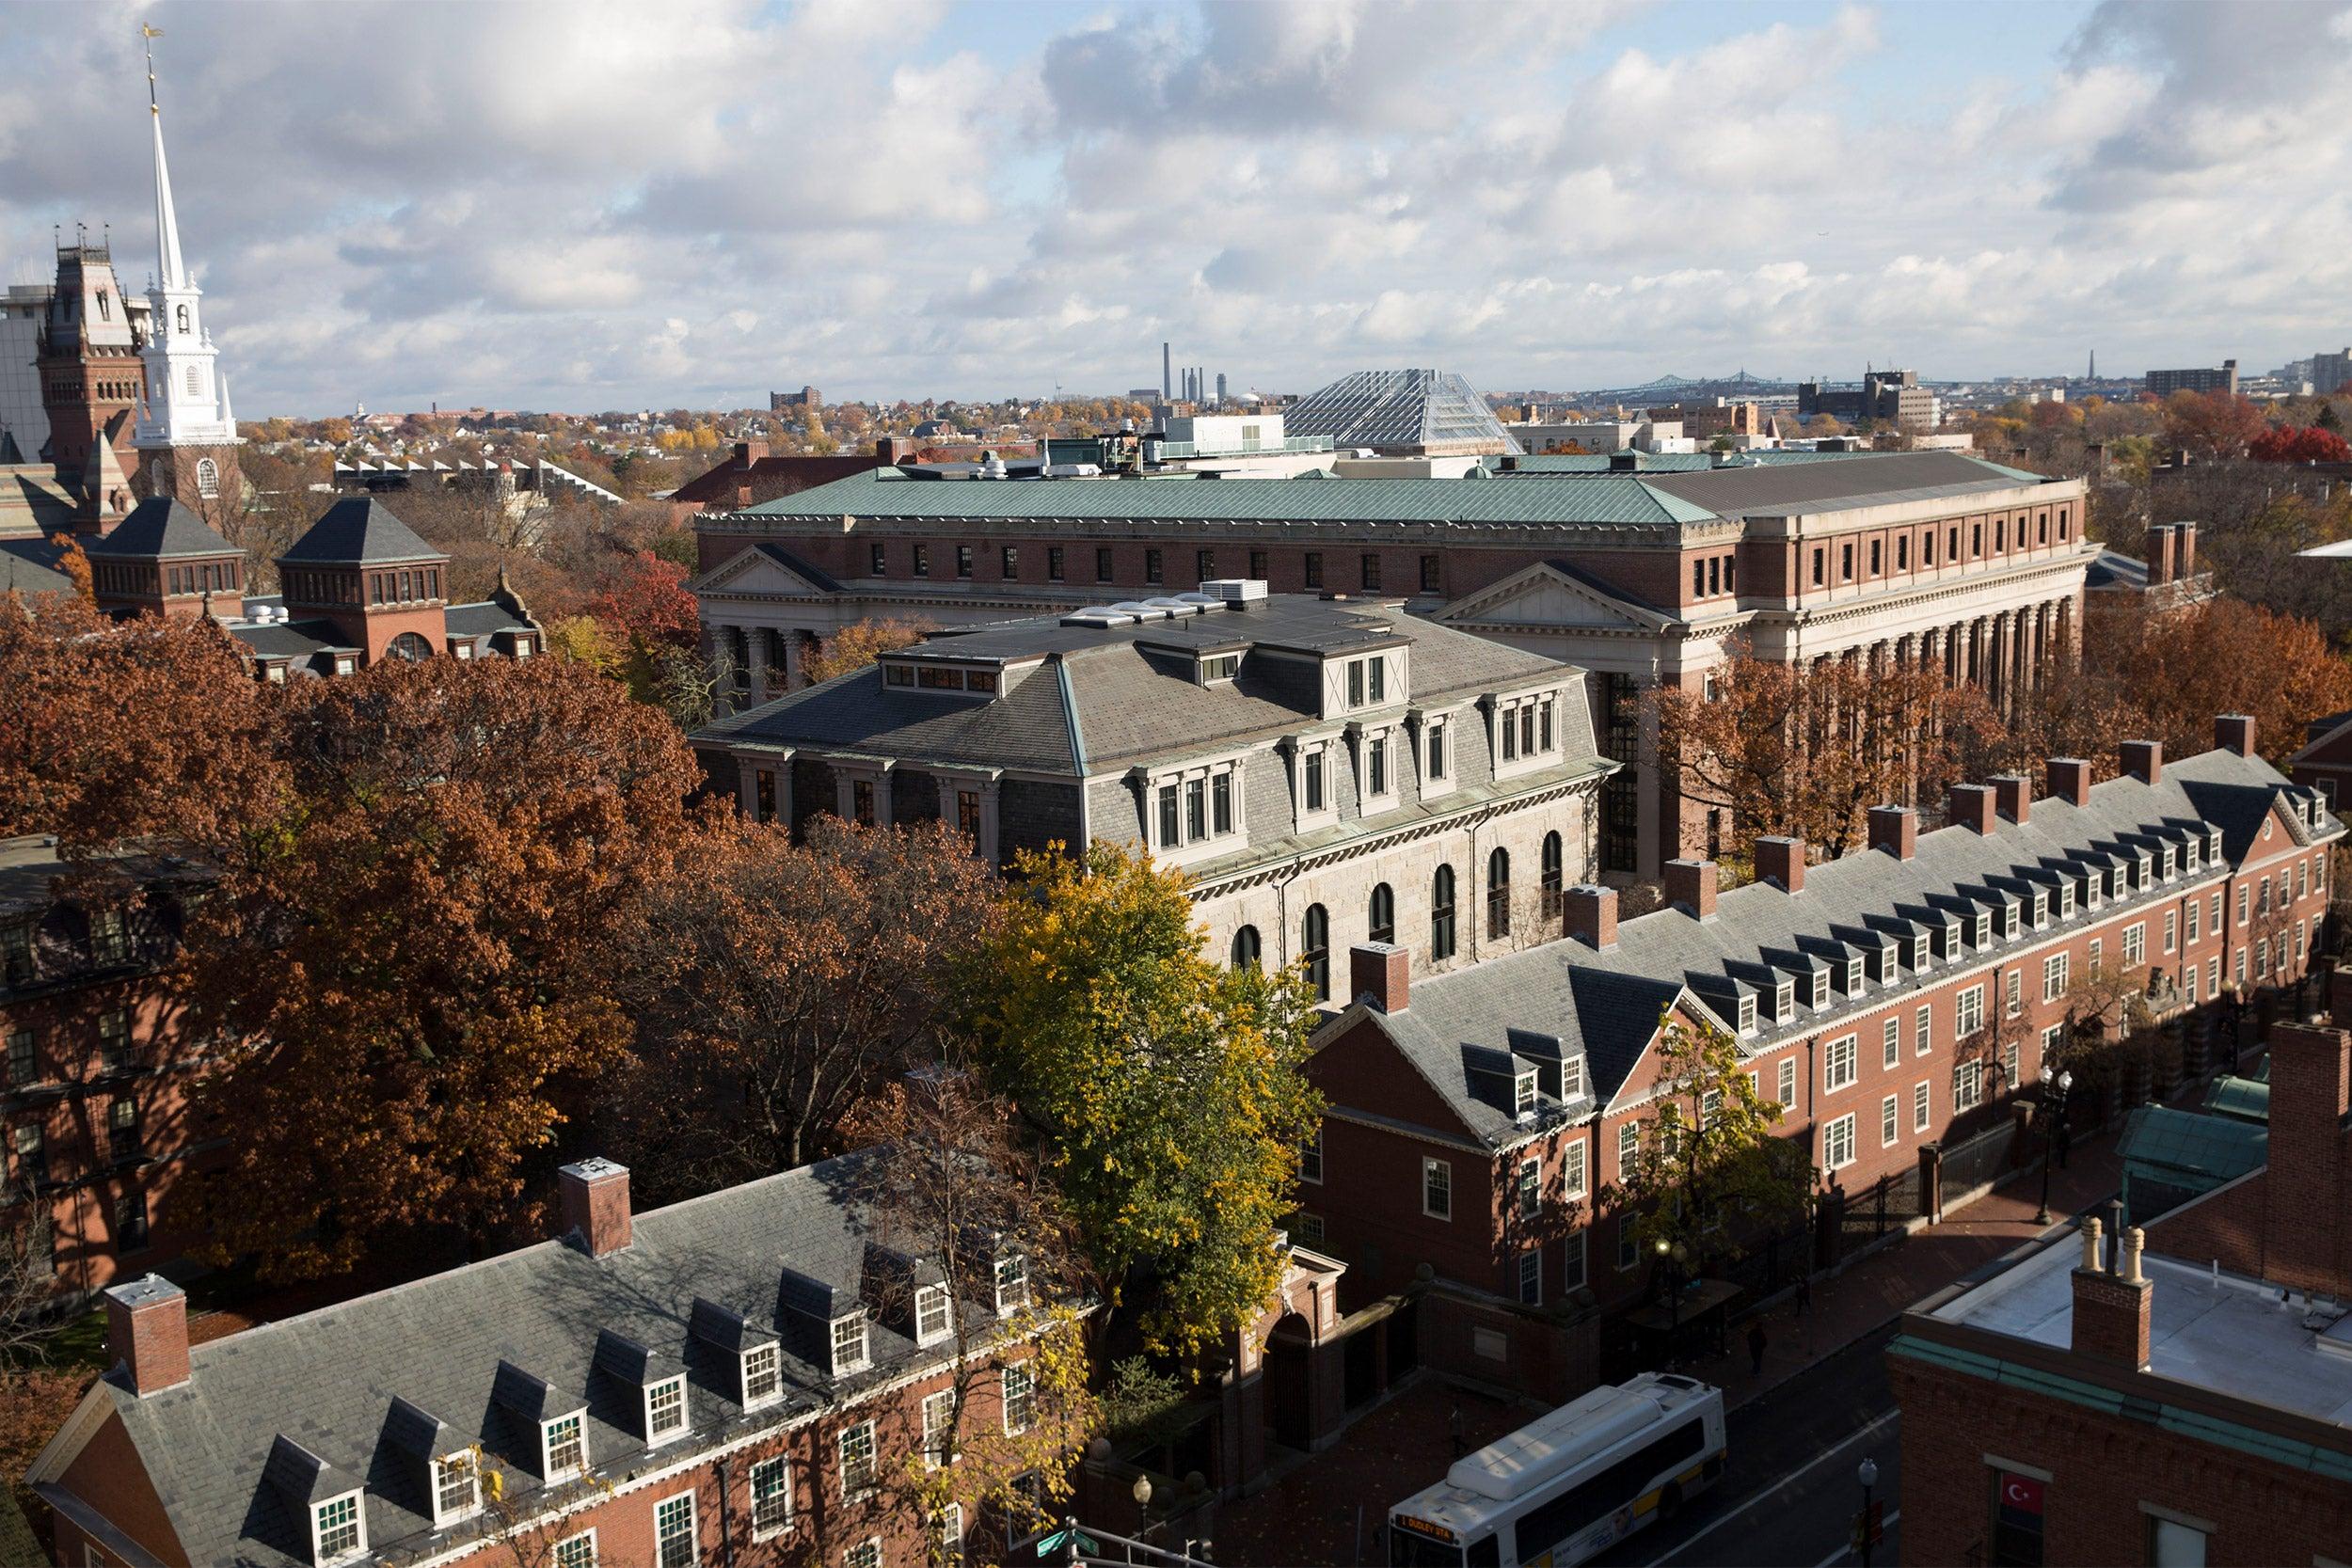 Overviews of Harvard Yard Memorial Church, Memorial Hall and Widener Library.